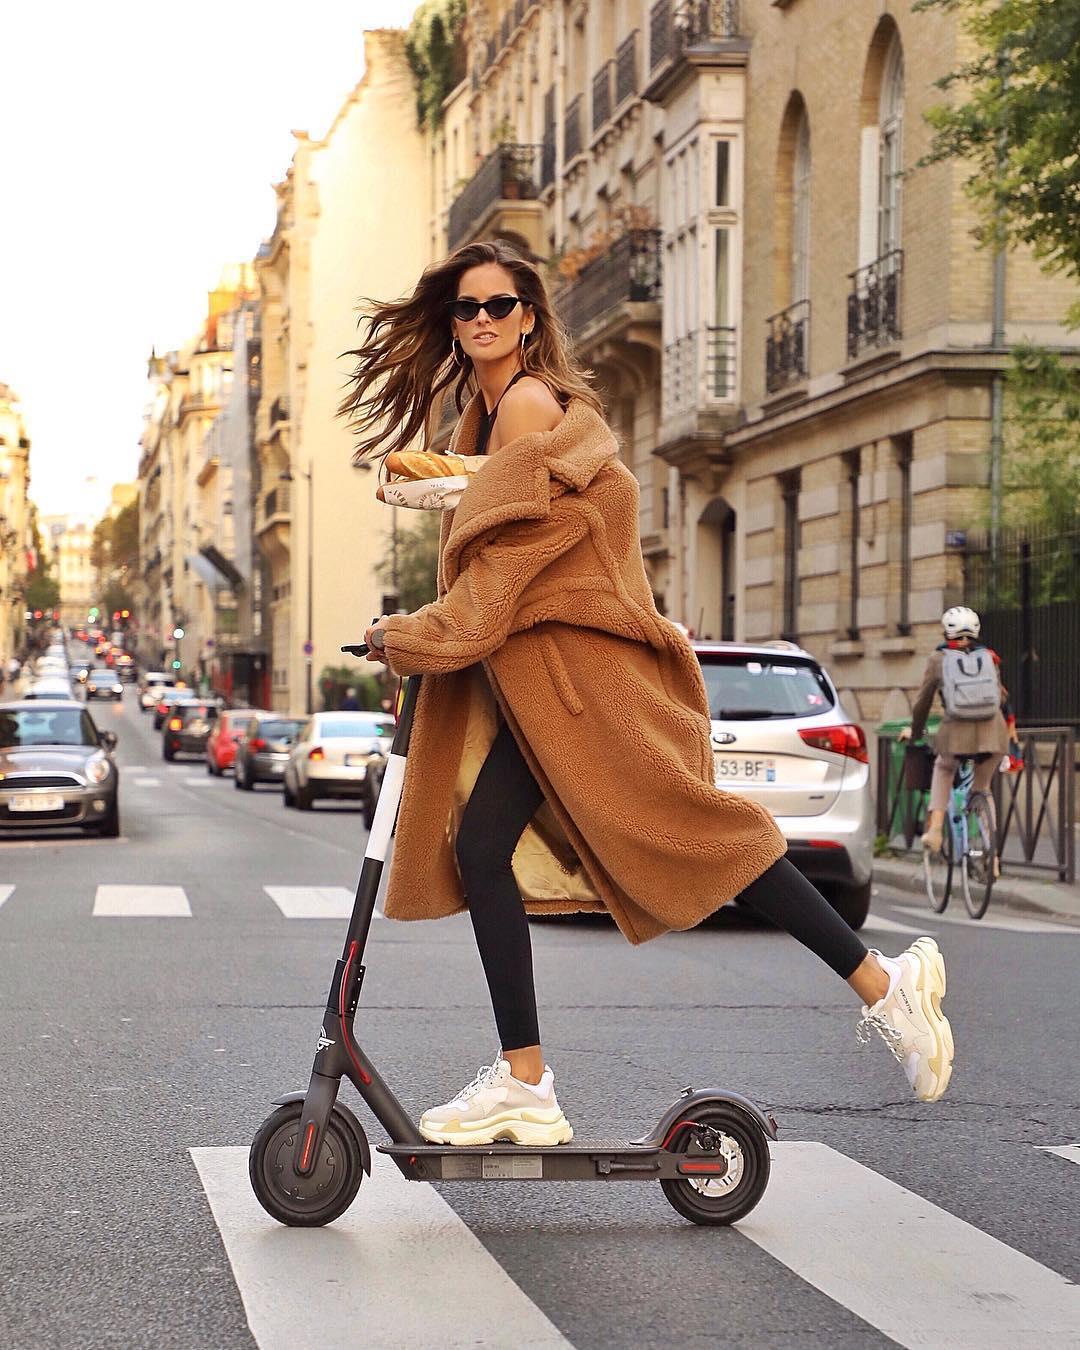 b18de5c568e izabel goulart abrigo zapatillas. Abrigo con zapatillas  la tendencia que  arrasa en Instagram este